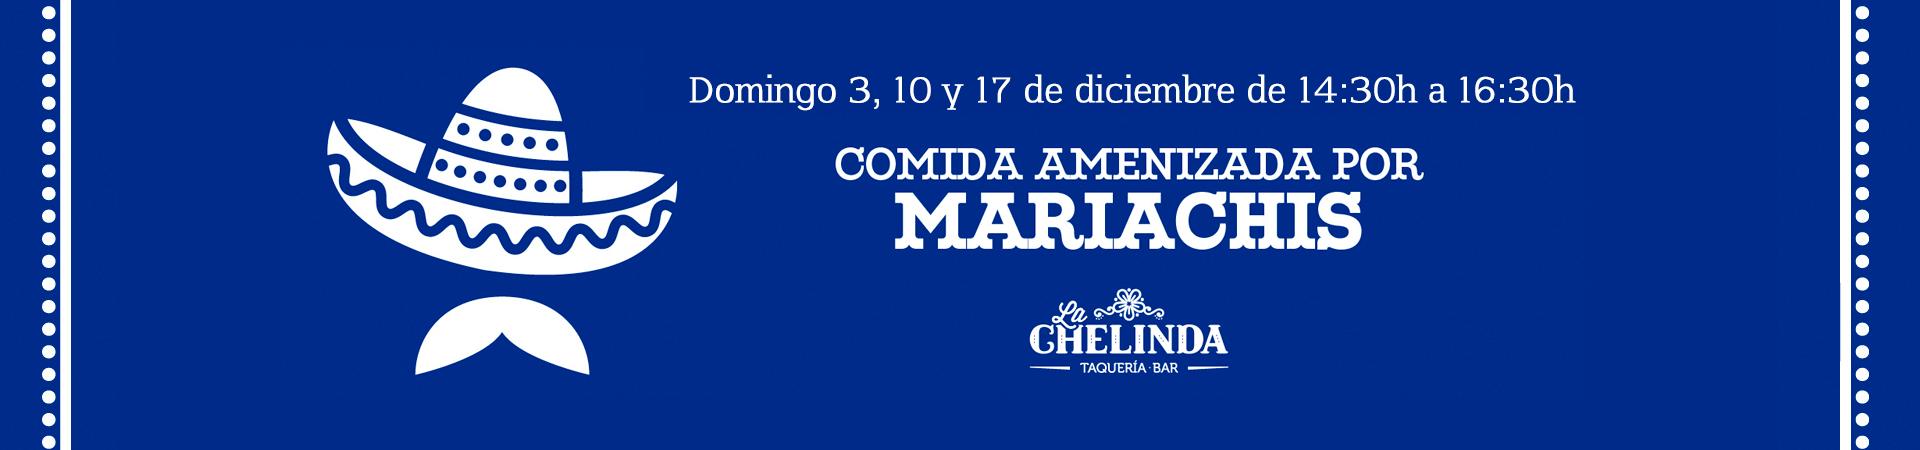 mariachis-chelinda-albacete